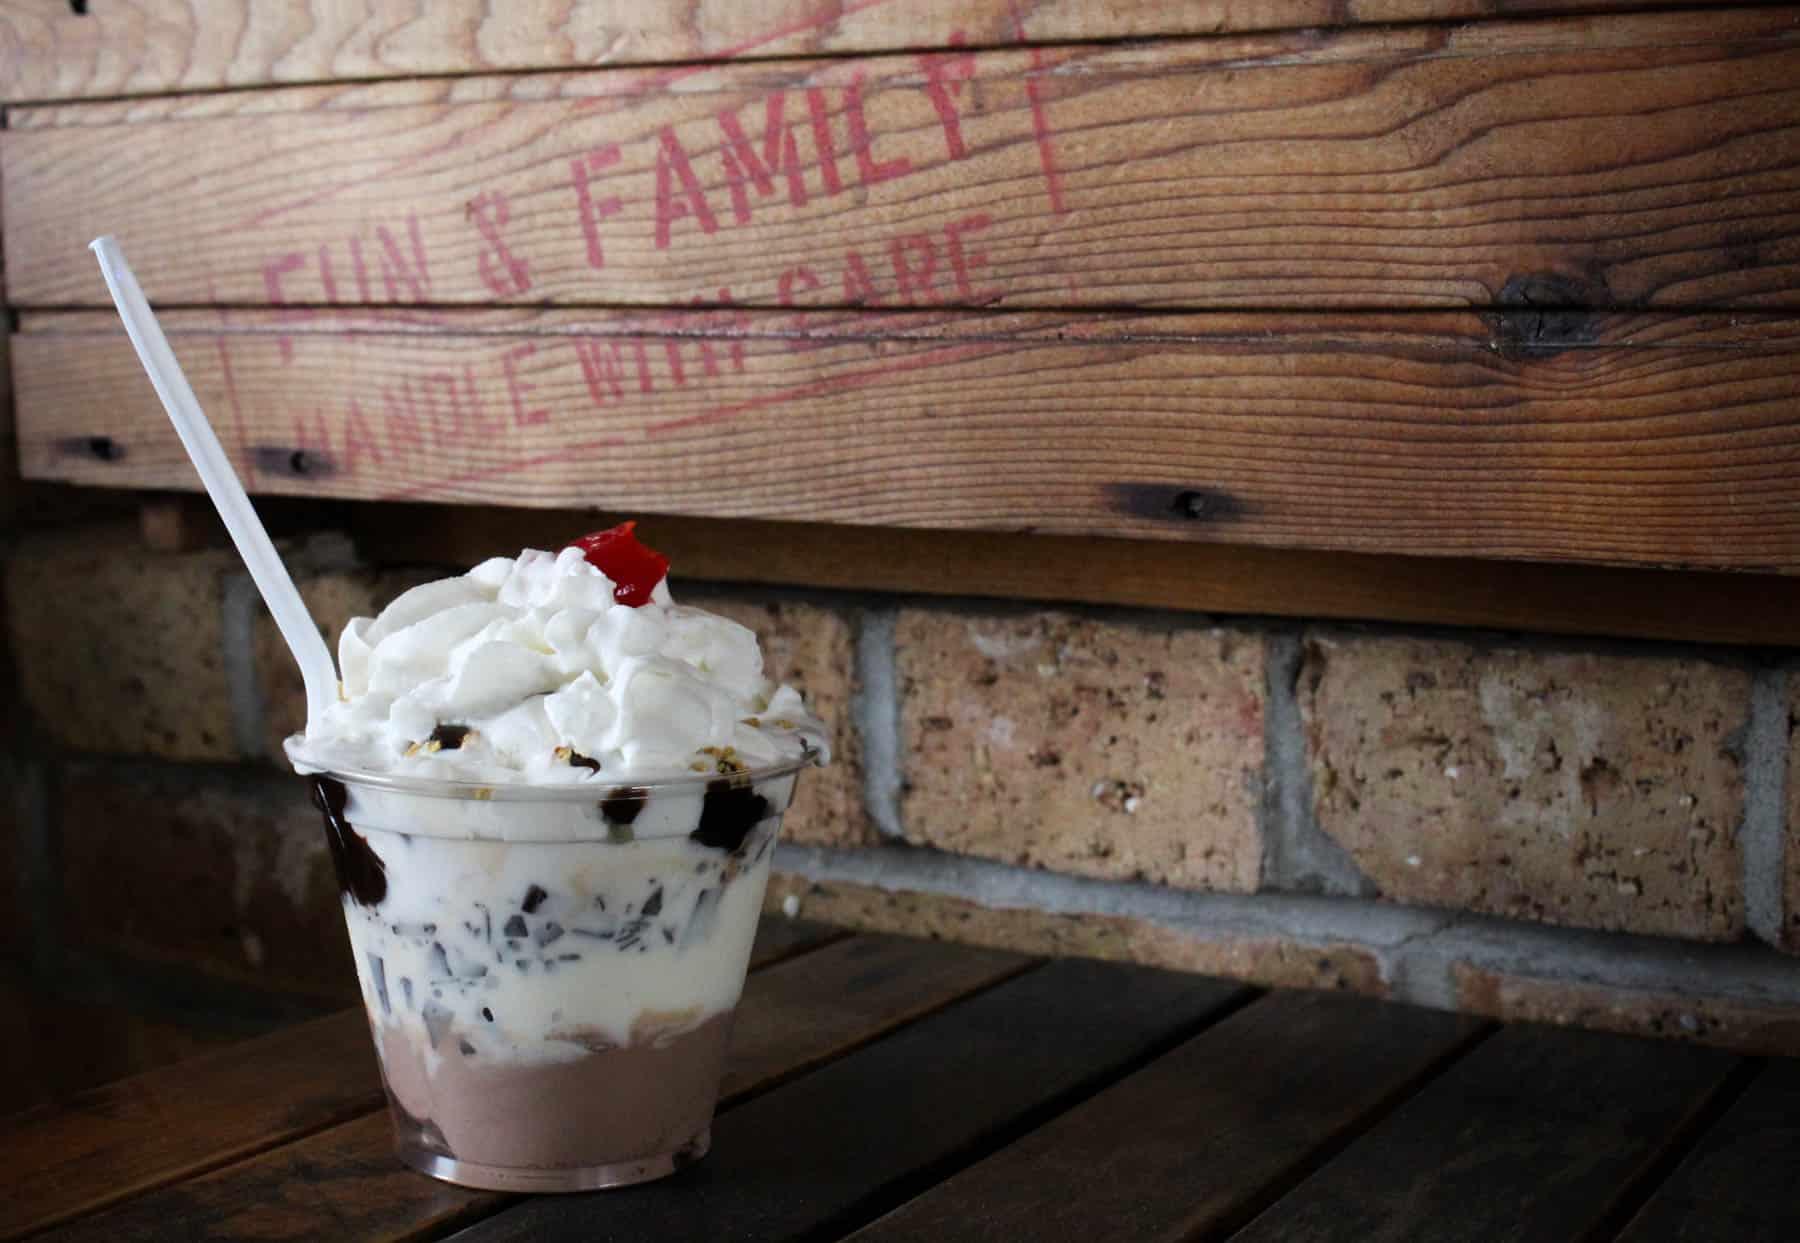 A post on Milwaukee custard featuring the best frozen custard spots in town.